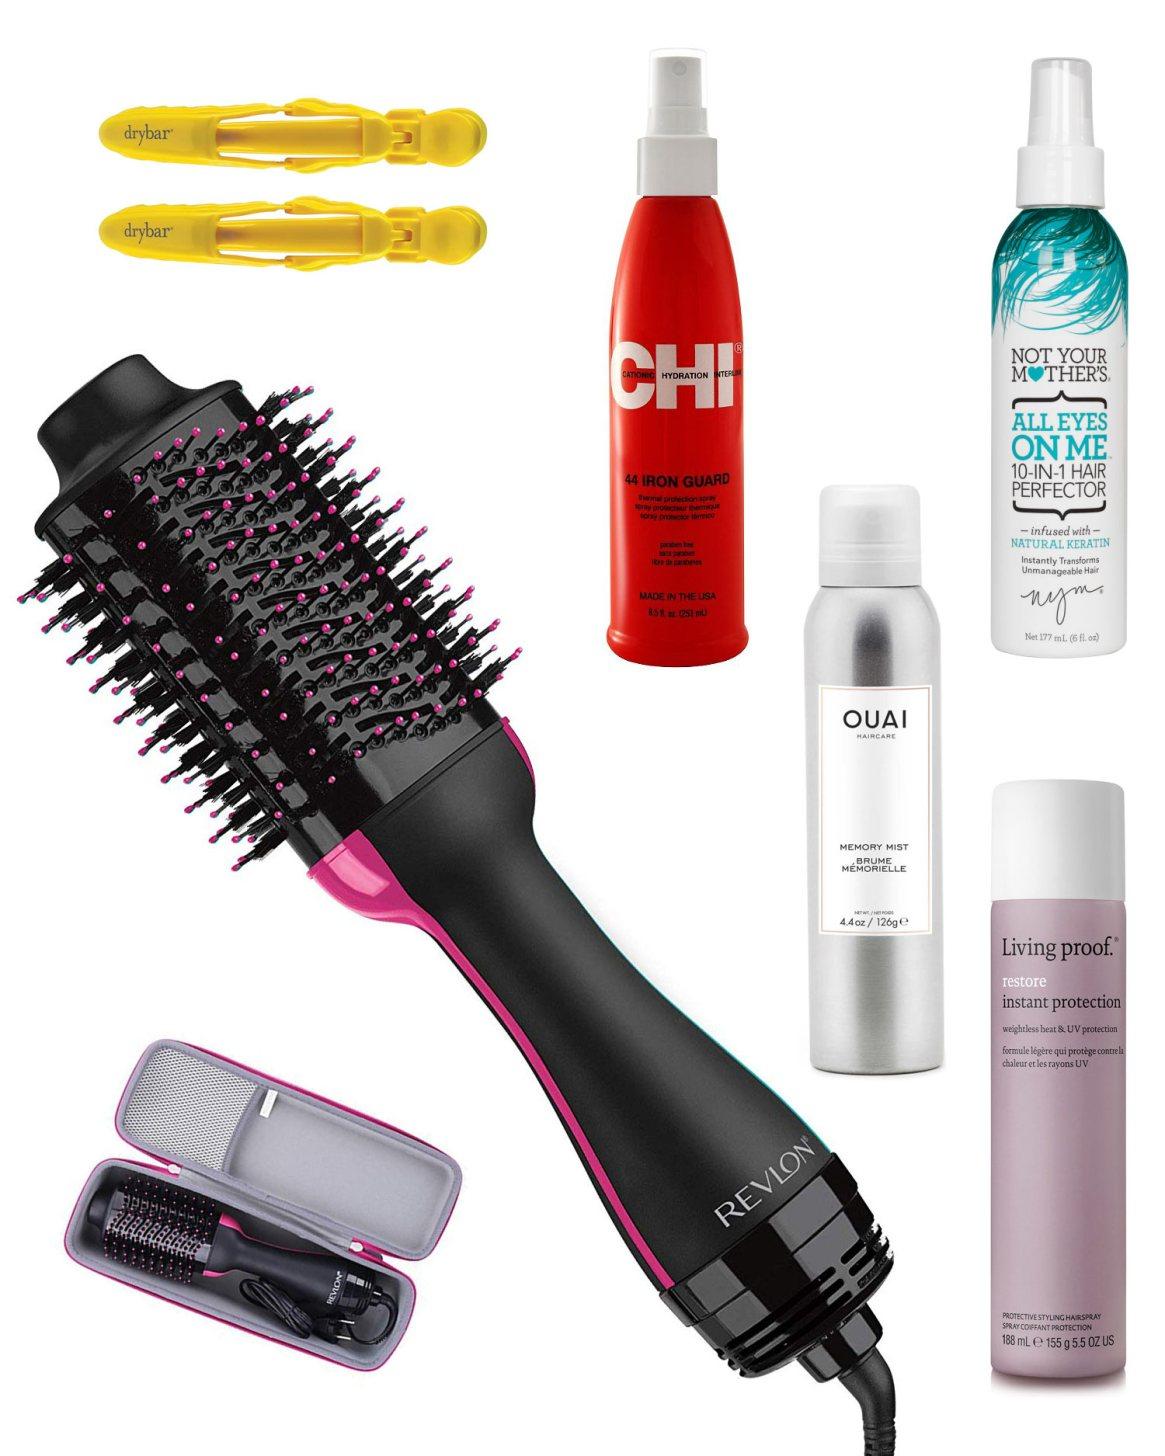 New-Favorite-Thing--Revlon-One-Step-Volumizer-Hair-Dryer